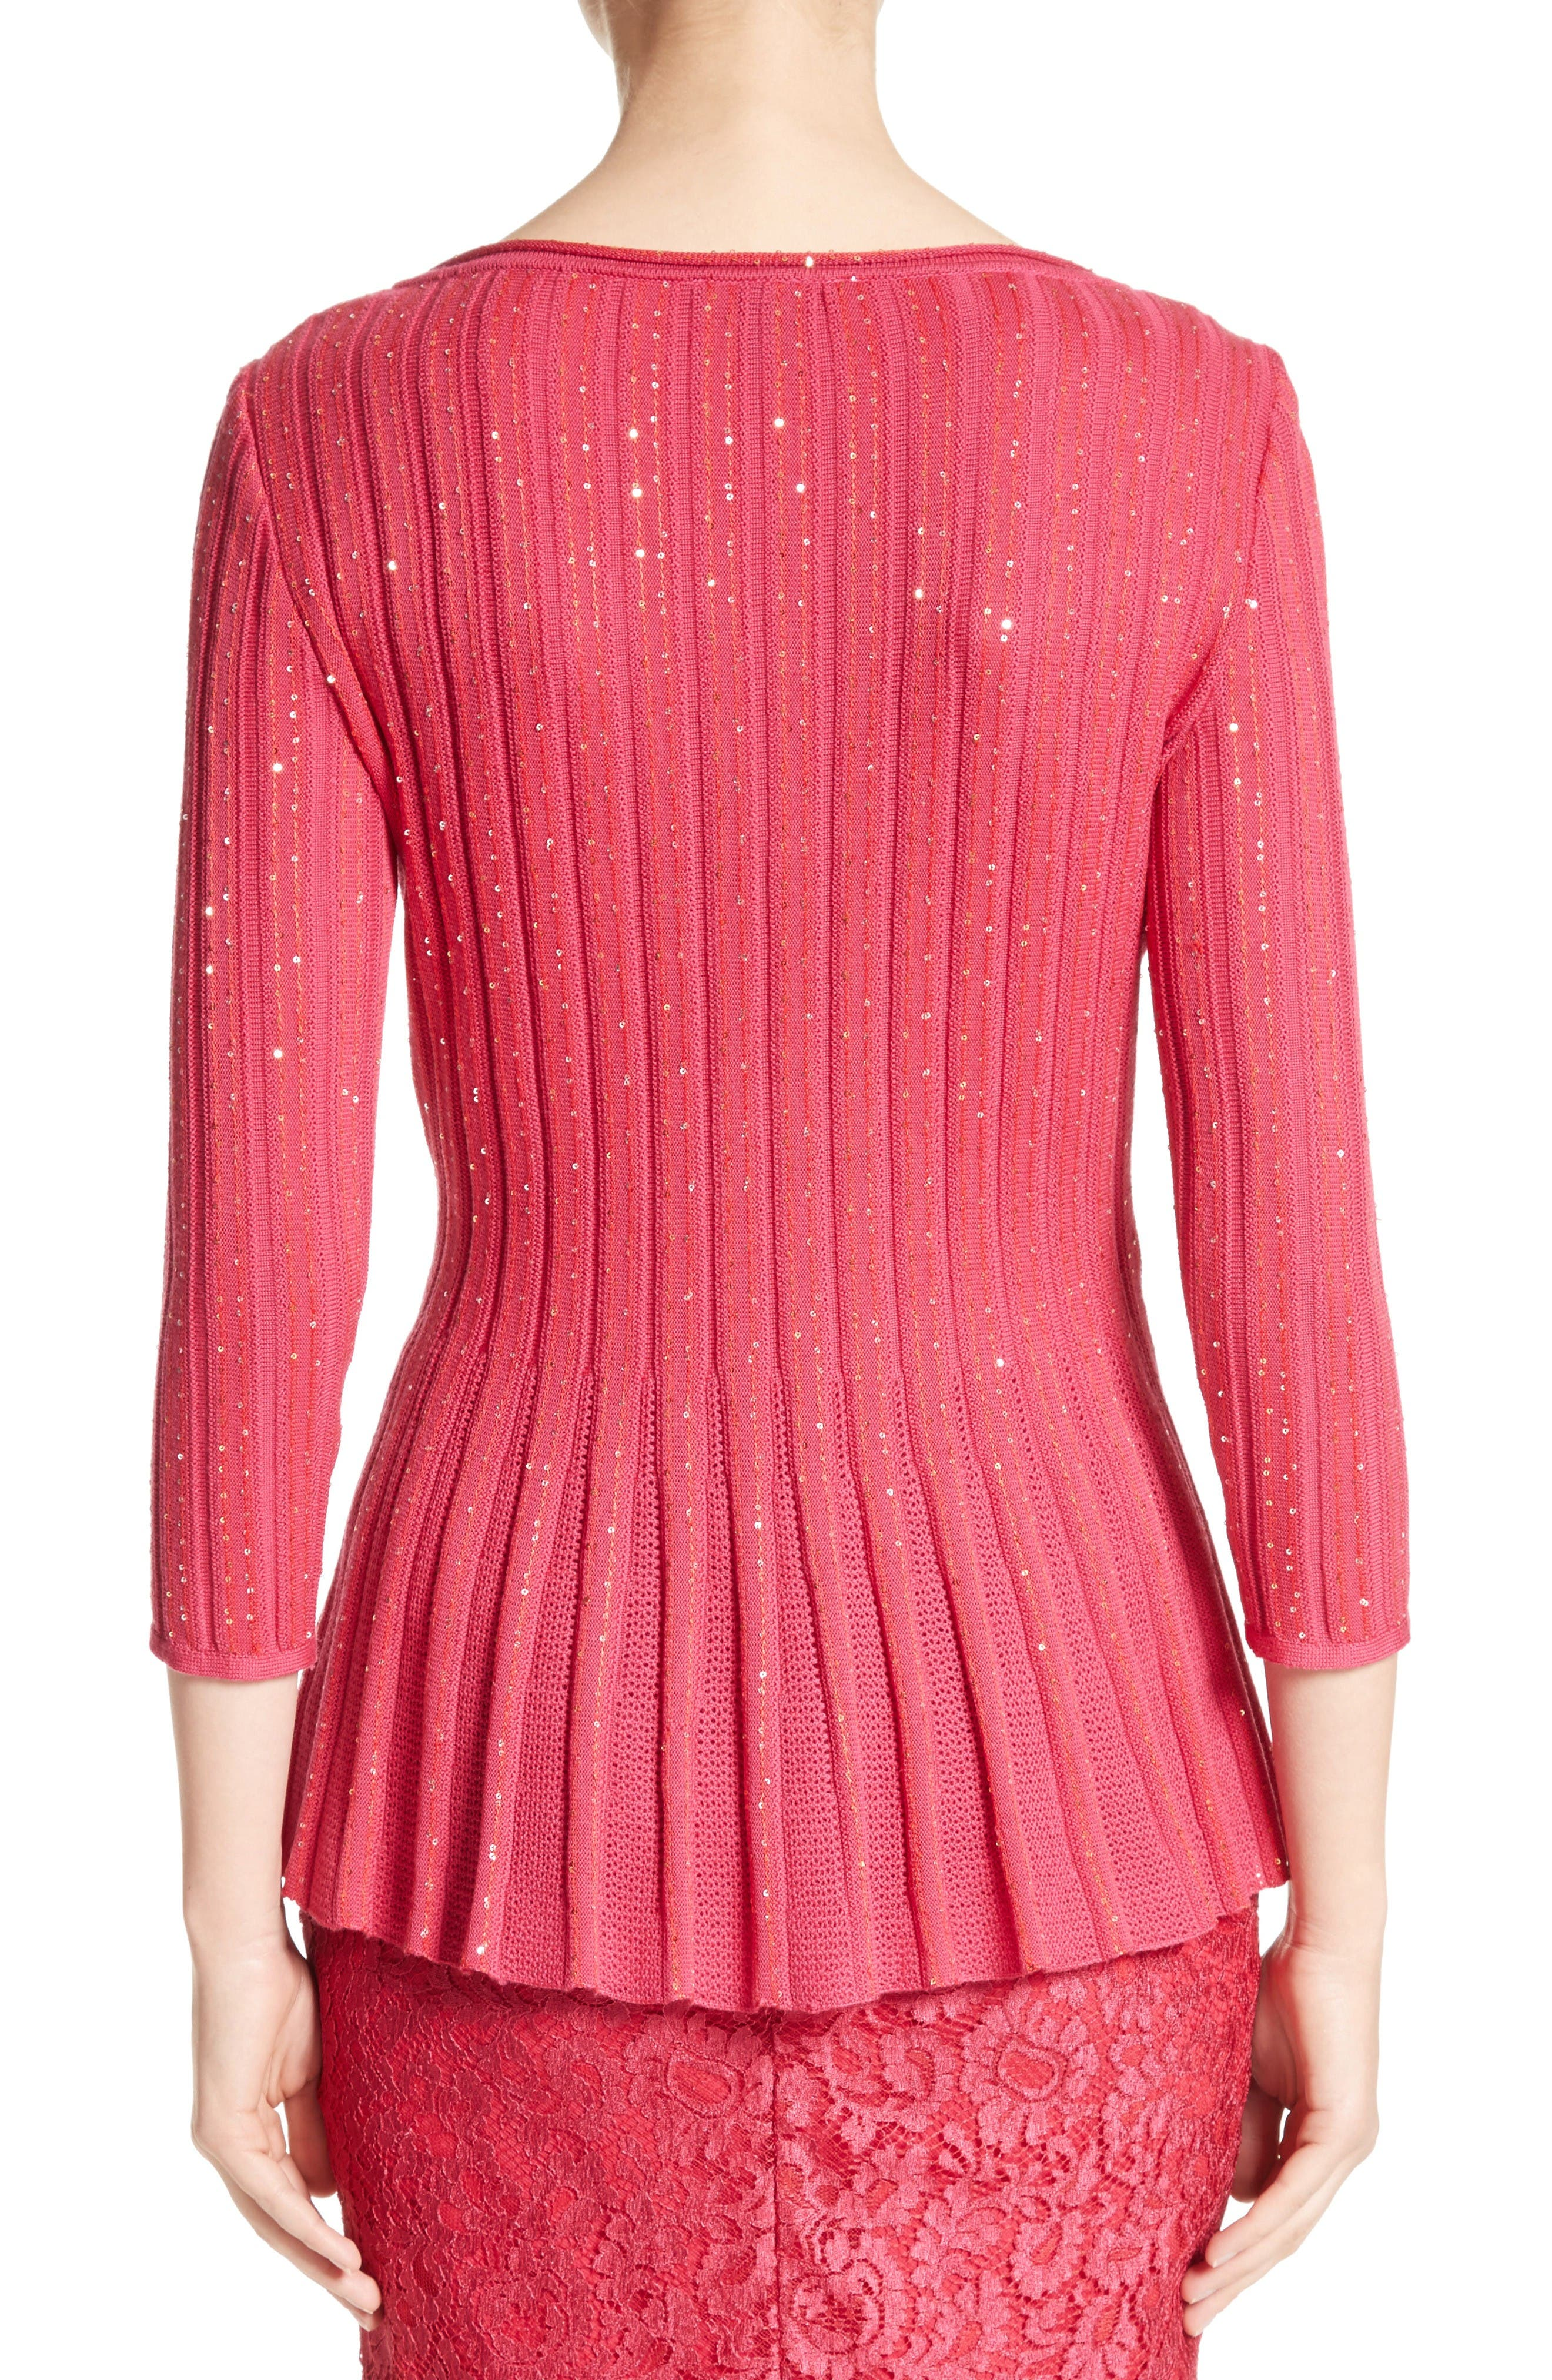 Chriag Sequin Knit Peplum Top,                             Alternate thumbnail 2, color,                             Indian Rose